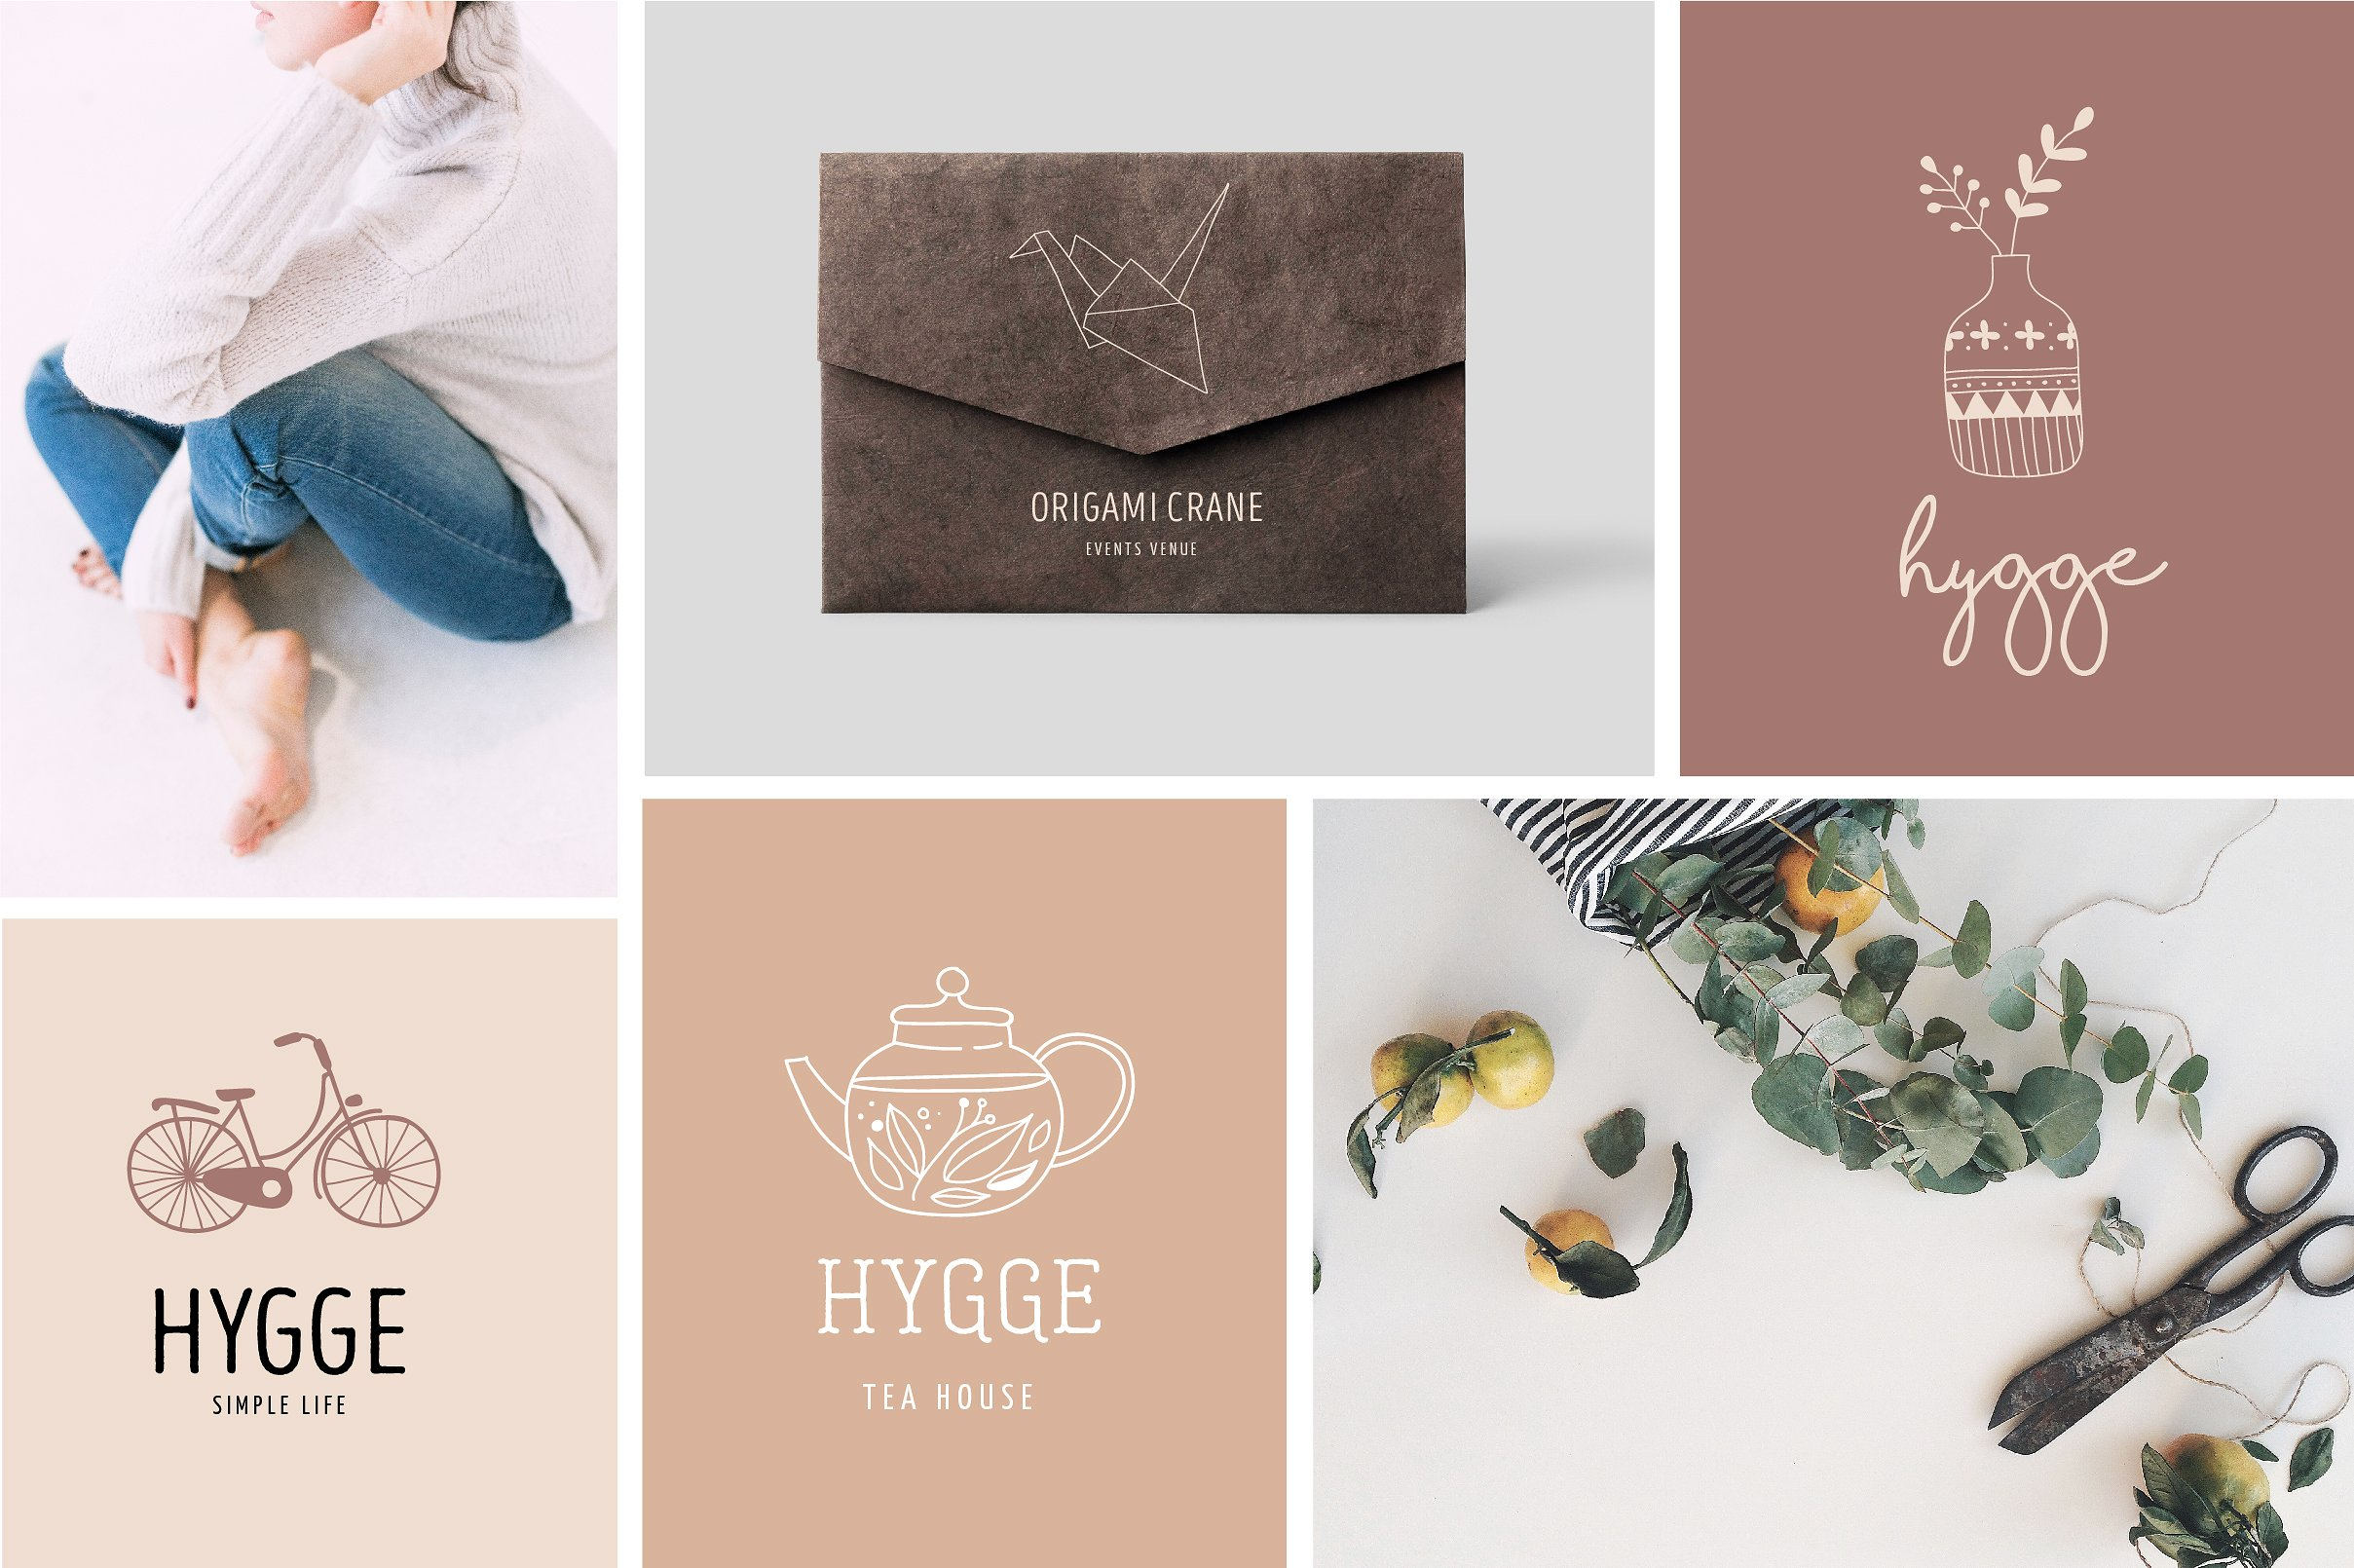 hygge-logos-01-.jpg